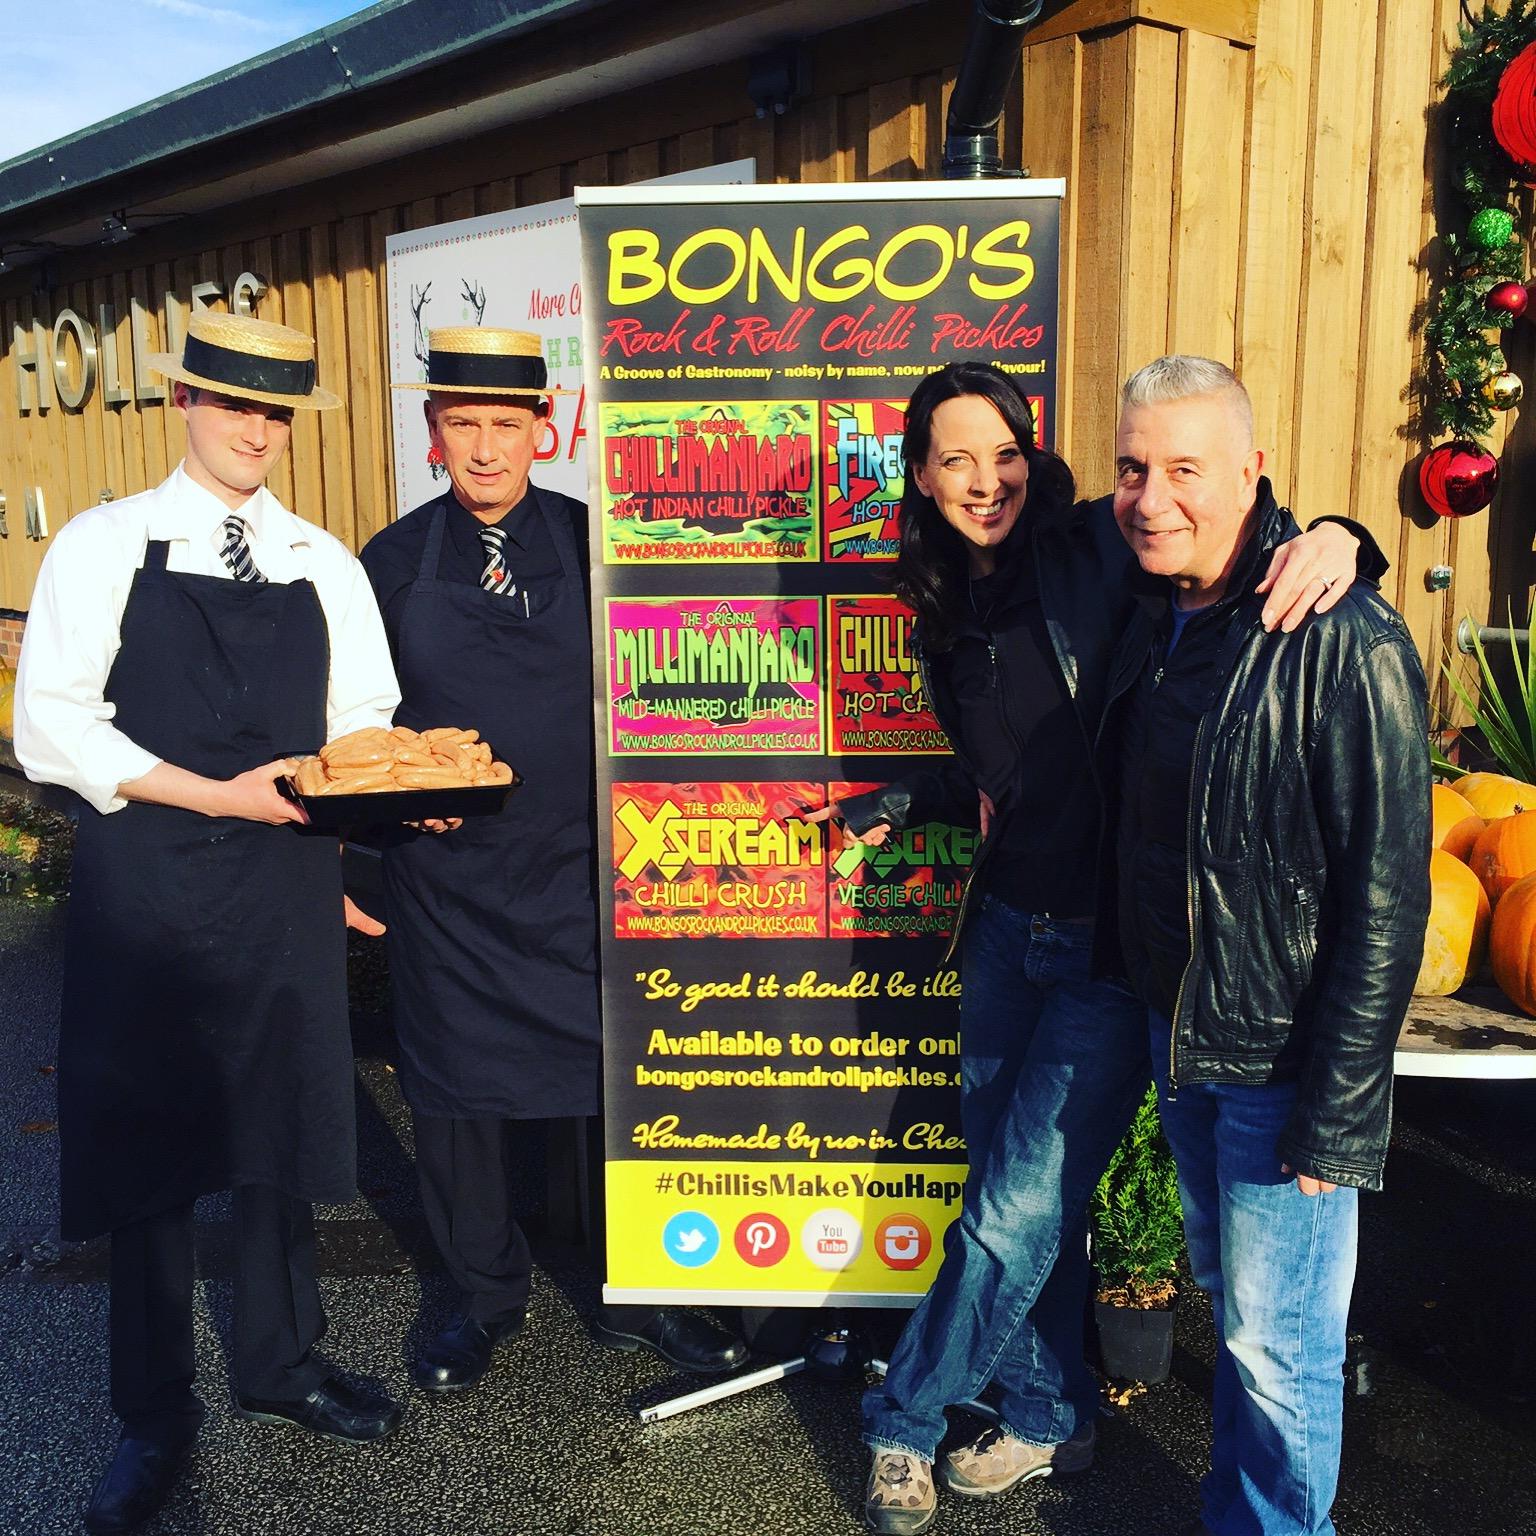 Bongos Rock & Roll Pickles The Hollies Farm Shops